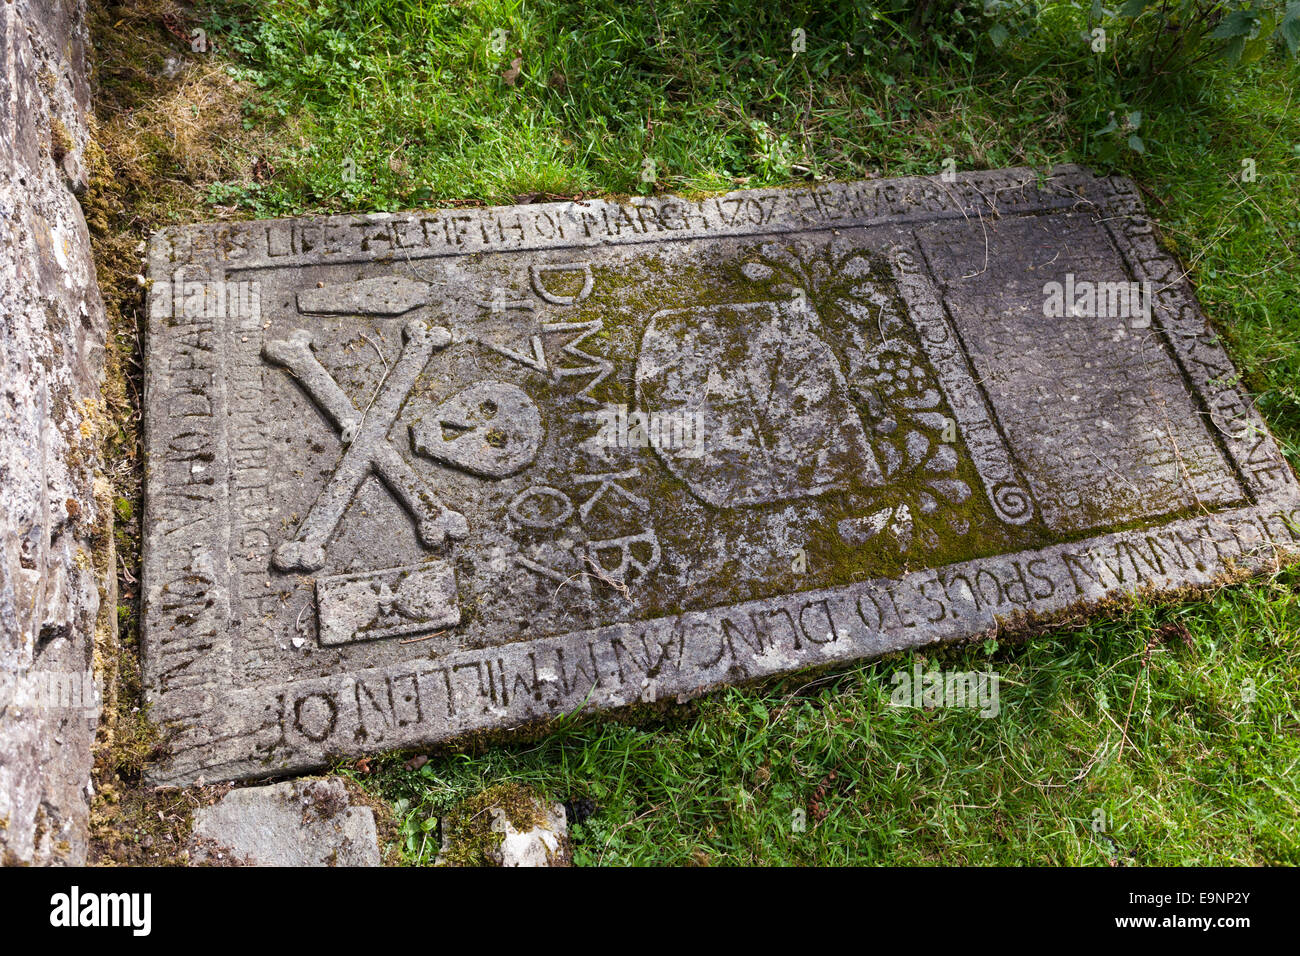 Granite Grave Slabs : Th century skull and crossbones motif on a grave slab in